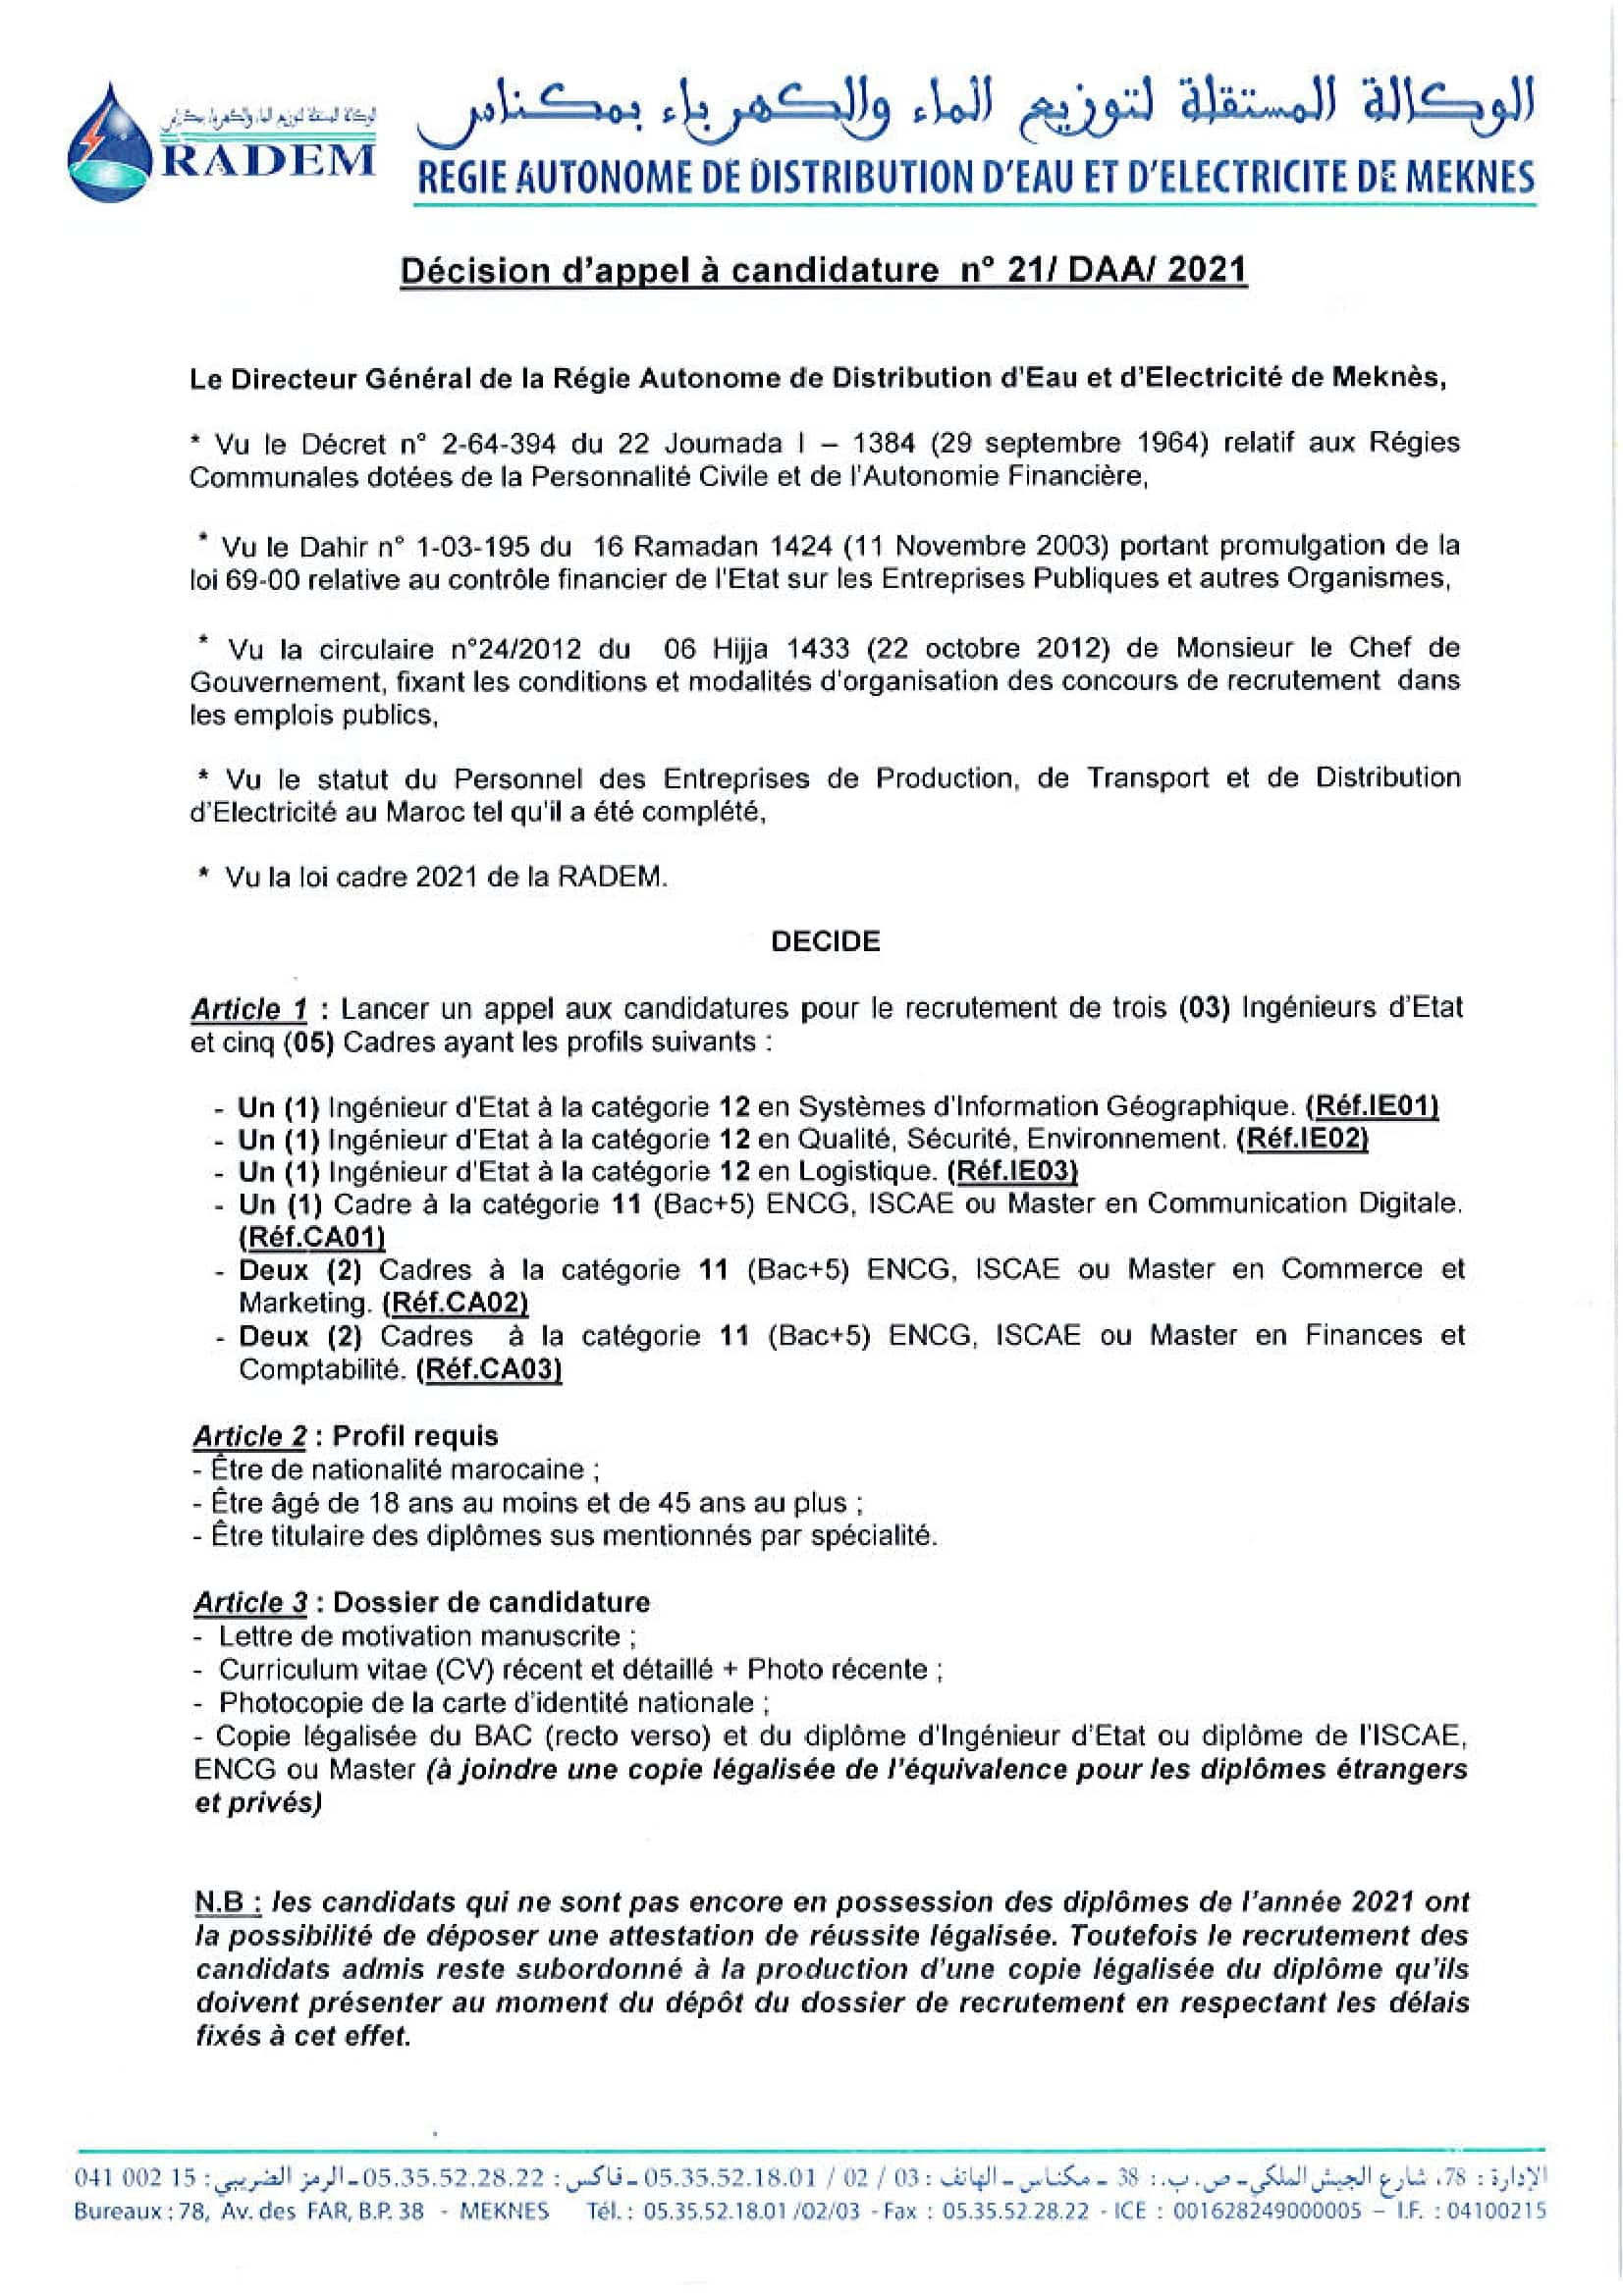 INGENIEURSETCADRES1 1 Concours de Recrutement RADEM 2021 (30 Postes)